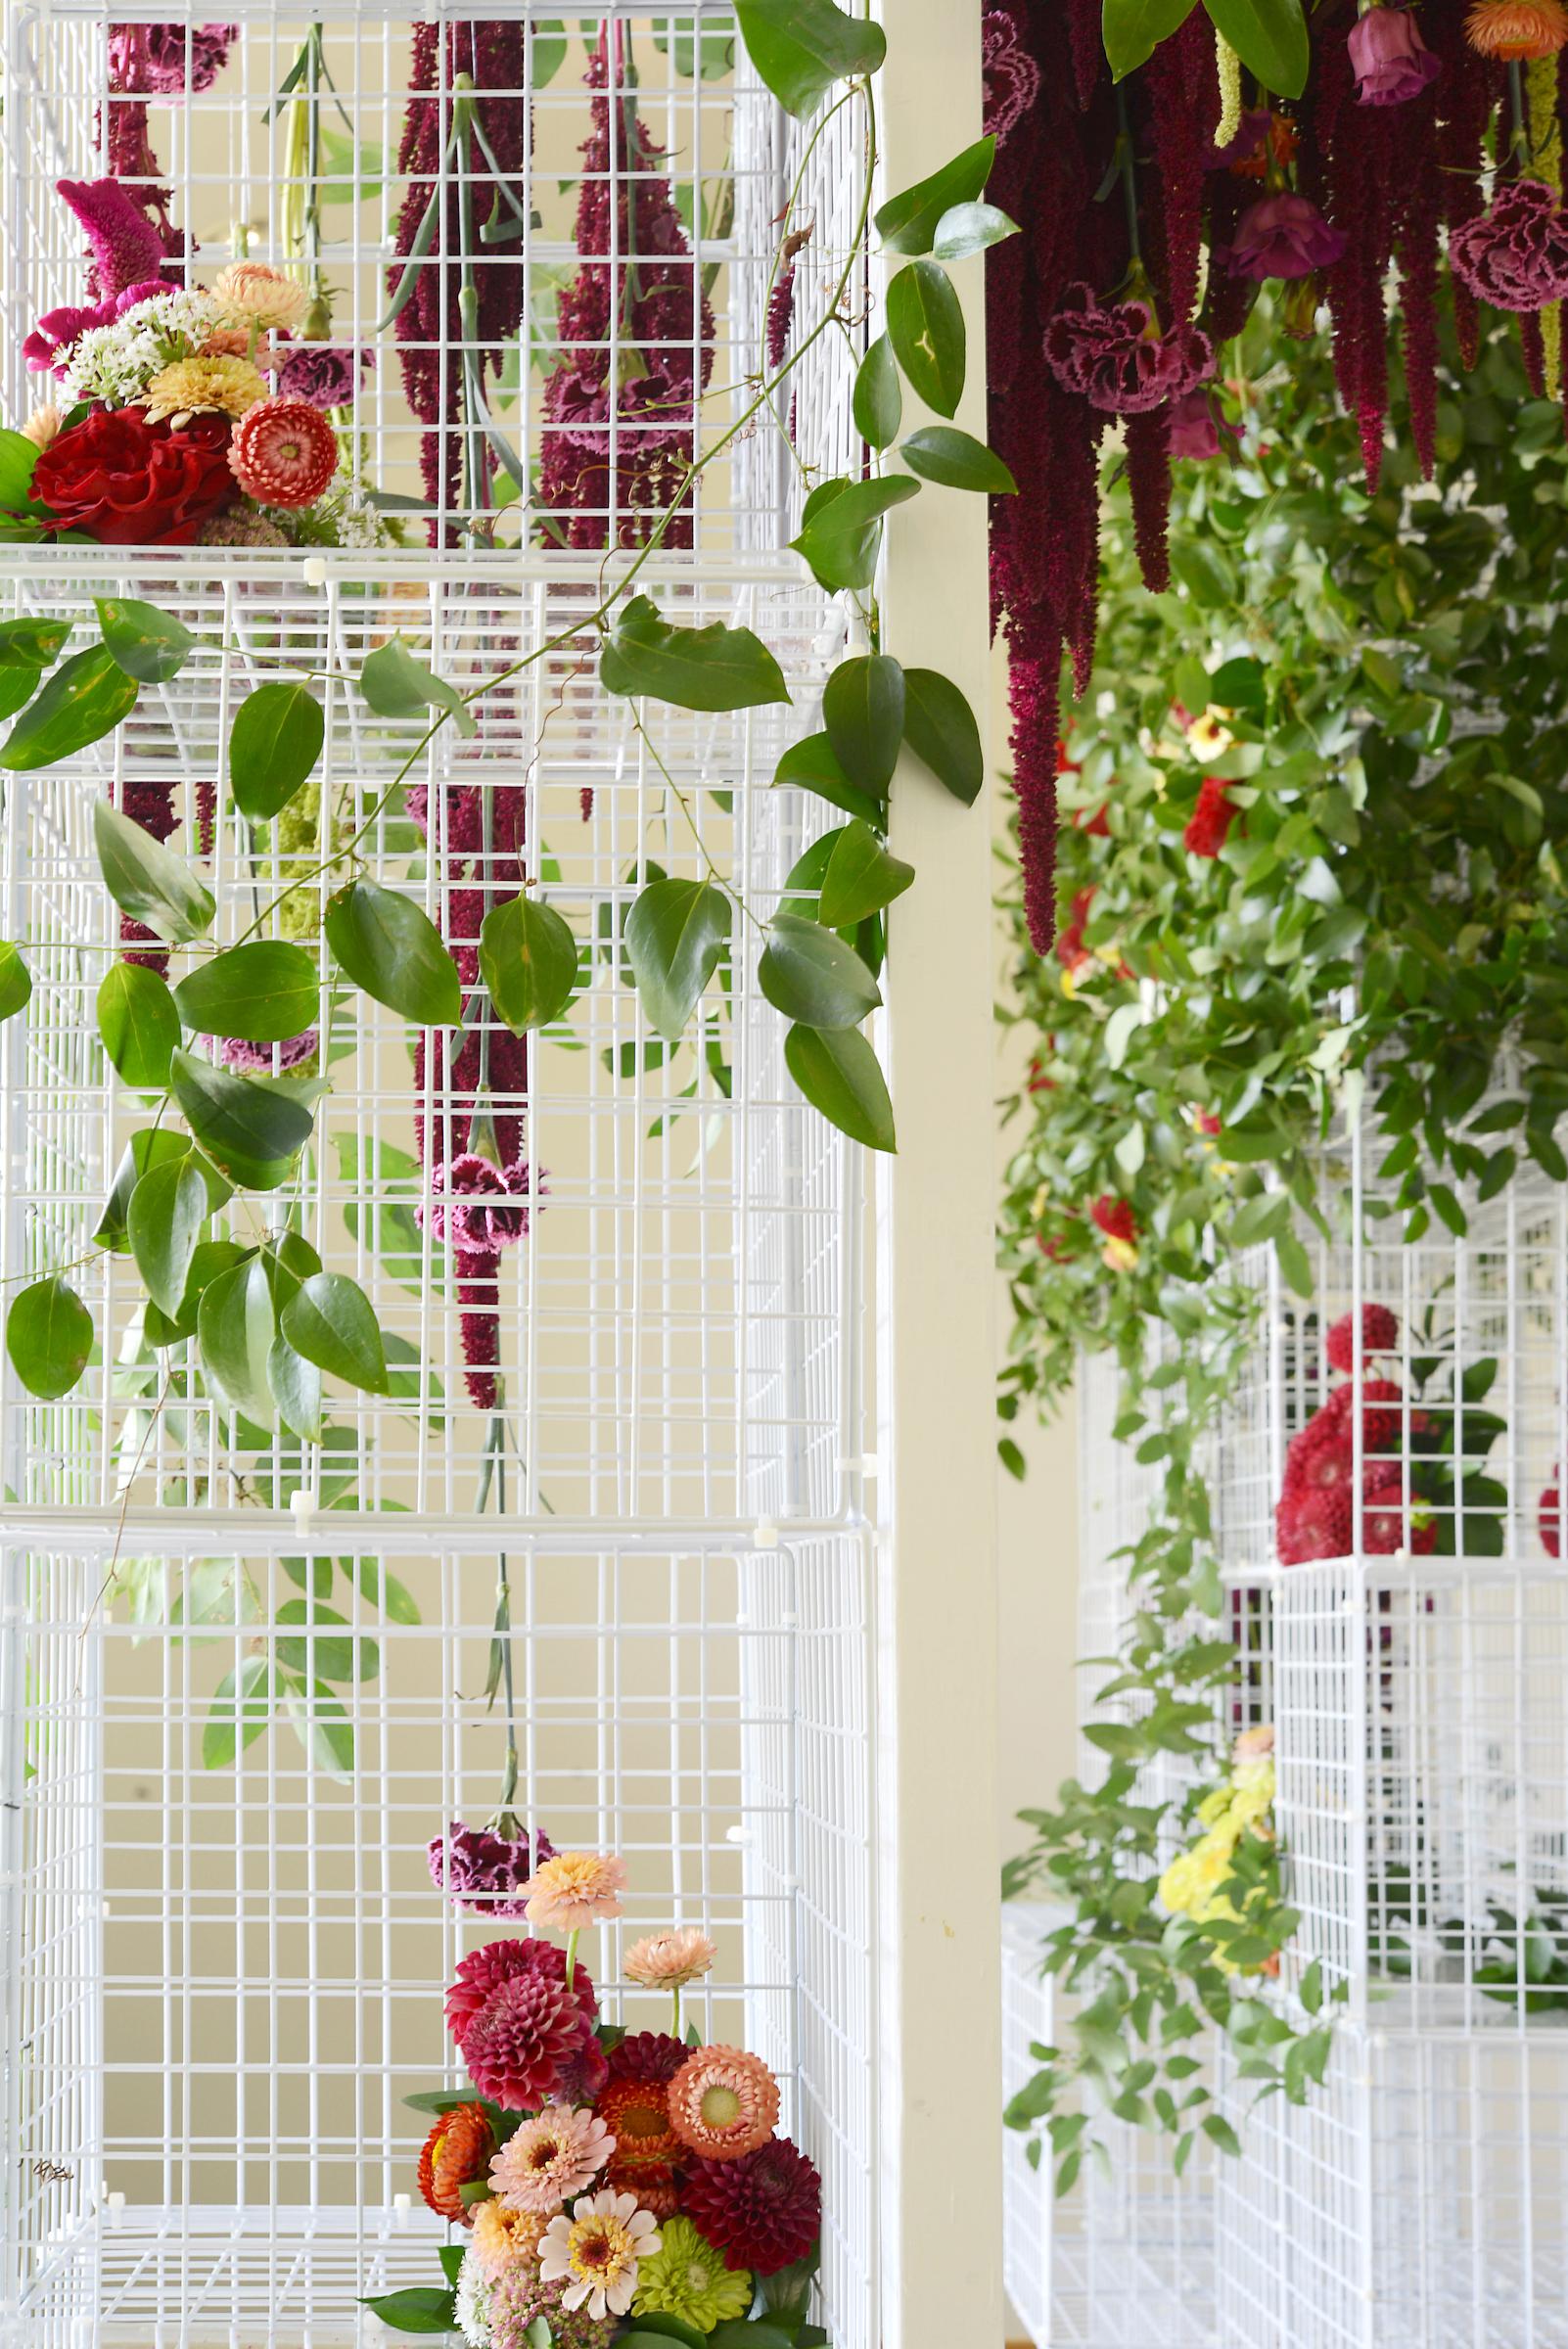 Full of details - tucked in arrangements, strings of flowers hanging inside